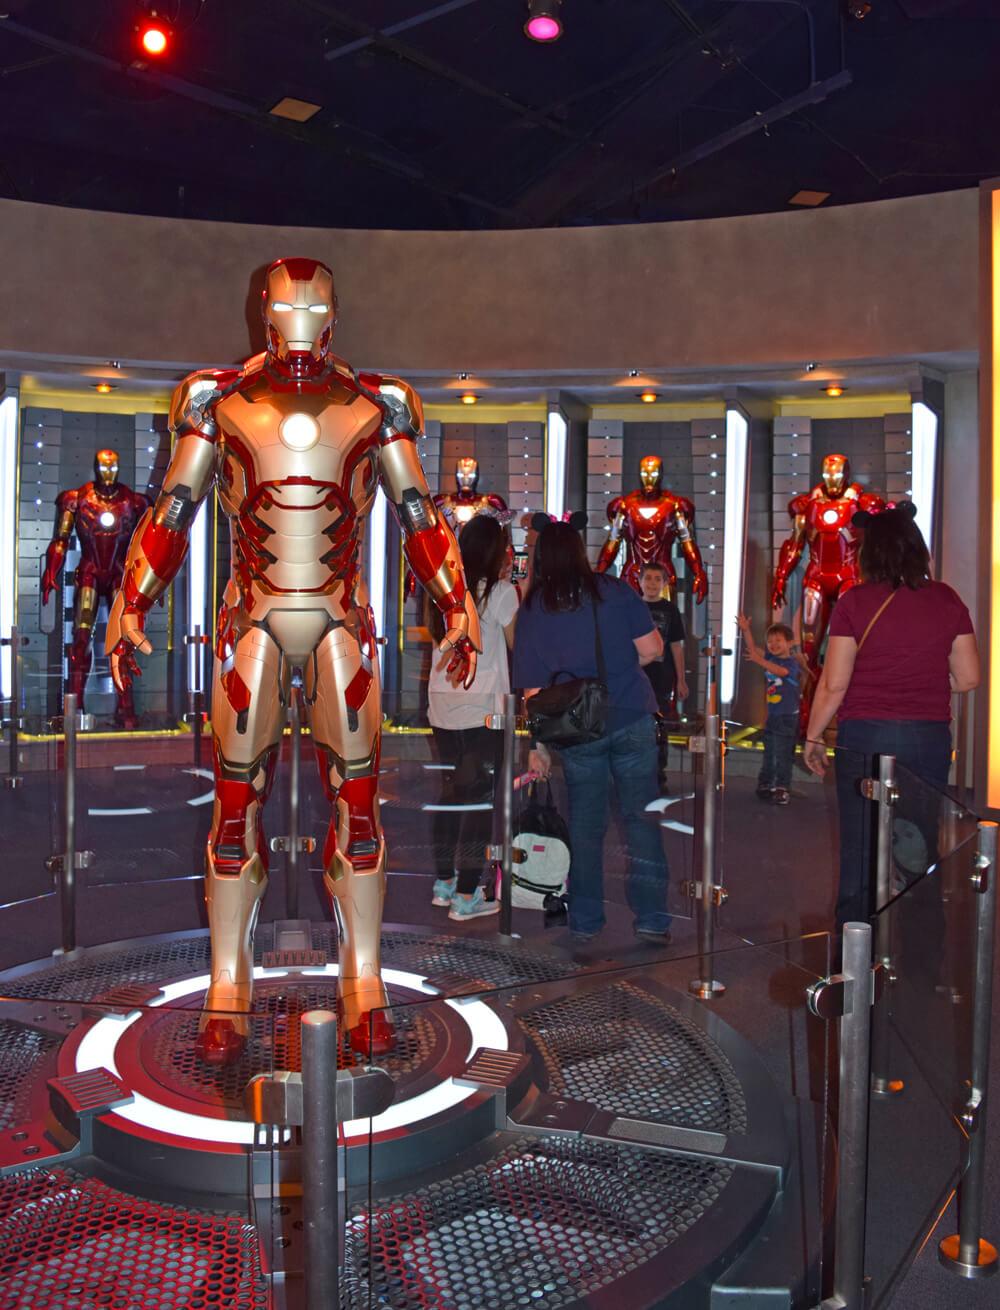 Disneyland's Super Hero HQ - Iron Man Suit